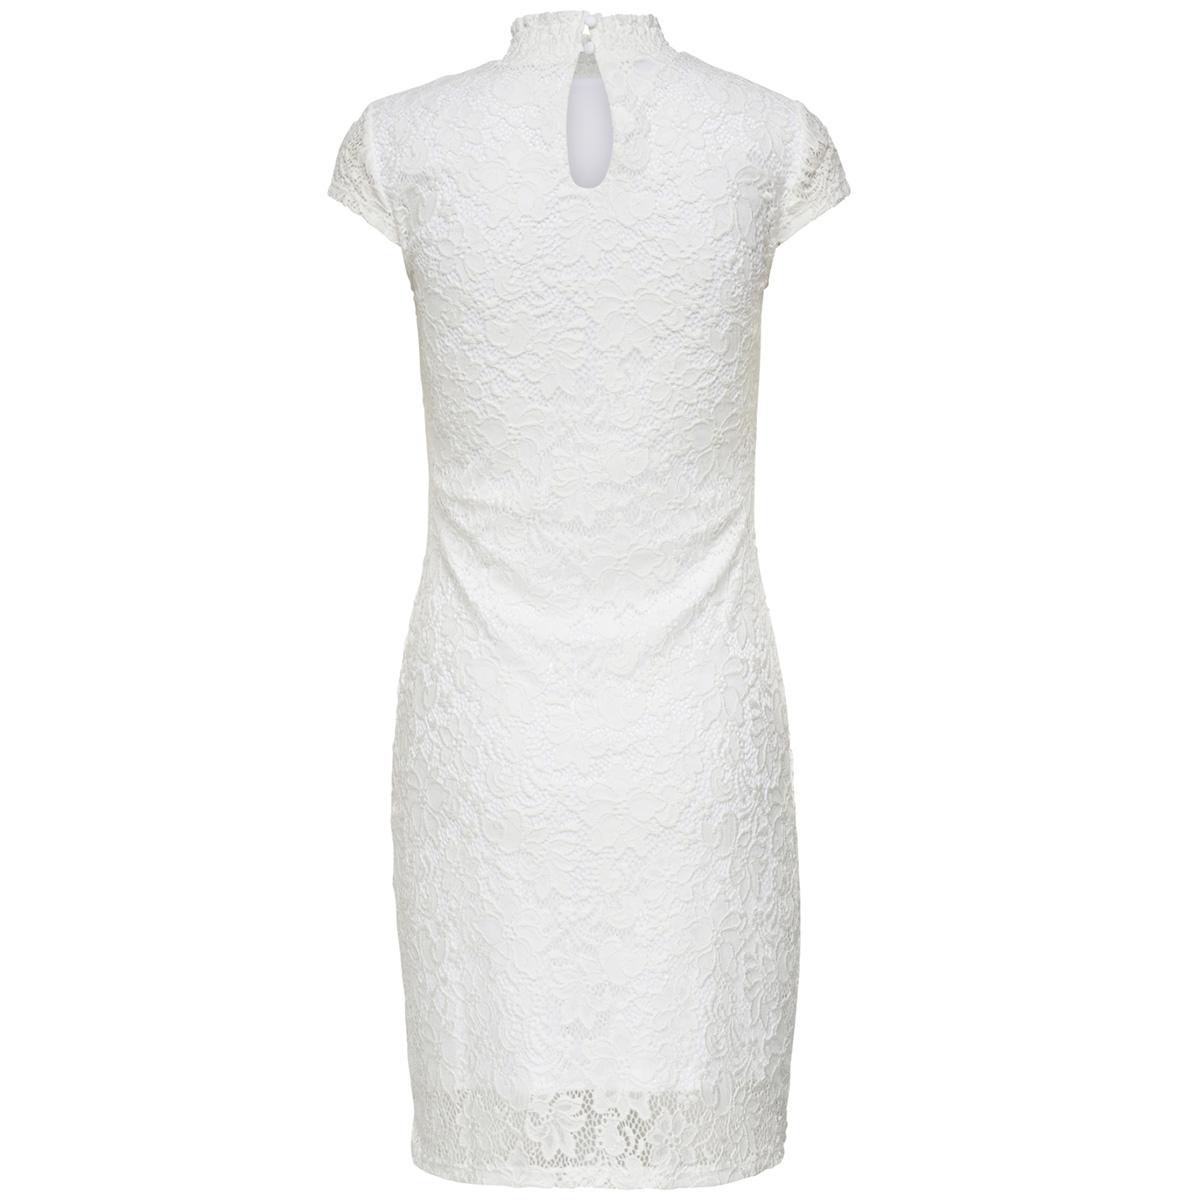 onlalba s/s bodycon dress jrs 15173874 only jurk cloud dancer